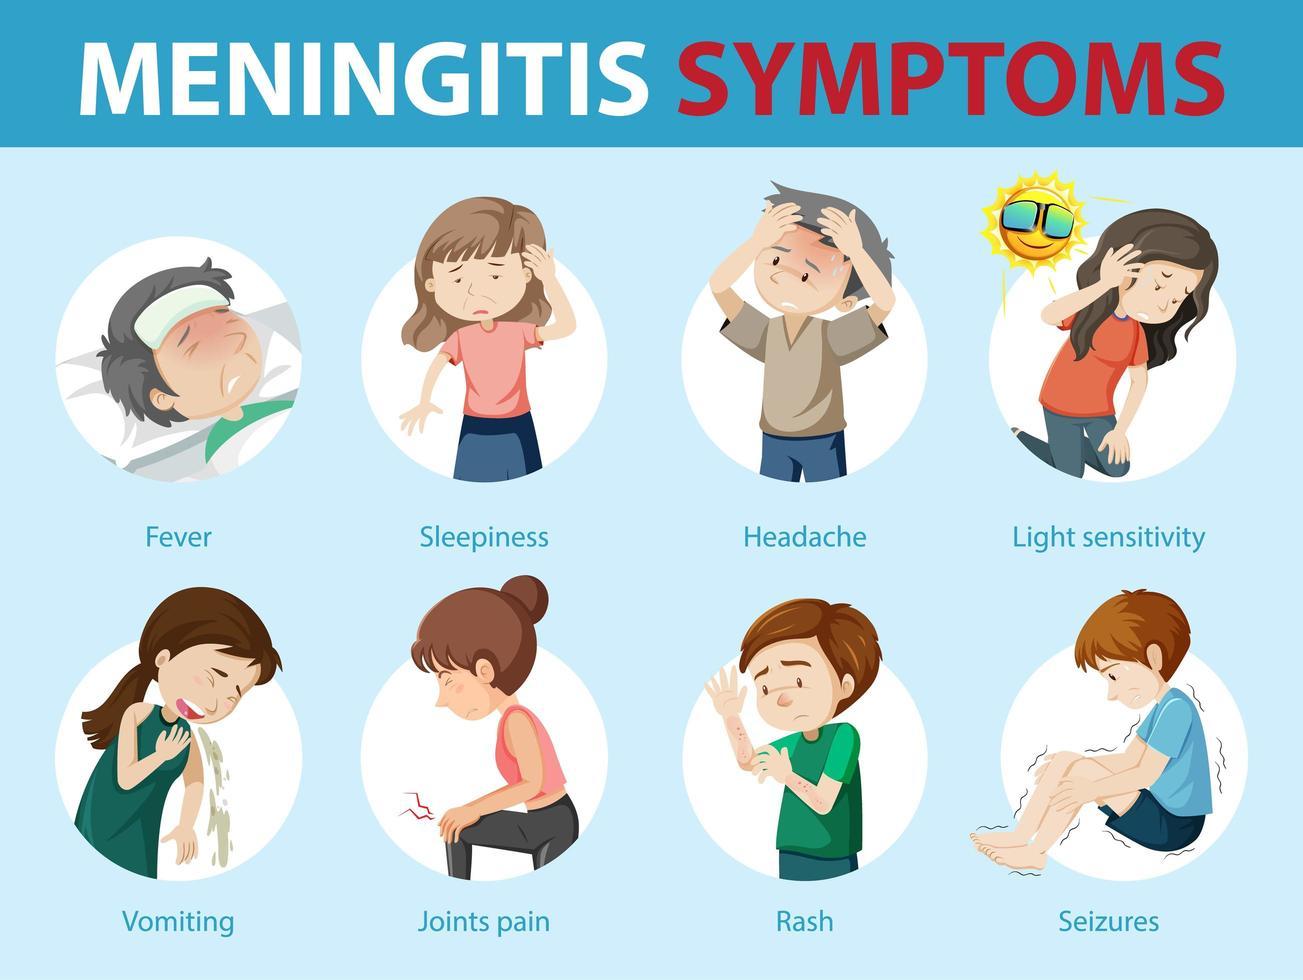 Meningitis Symptome Cartoon-Stil Infografik vektor